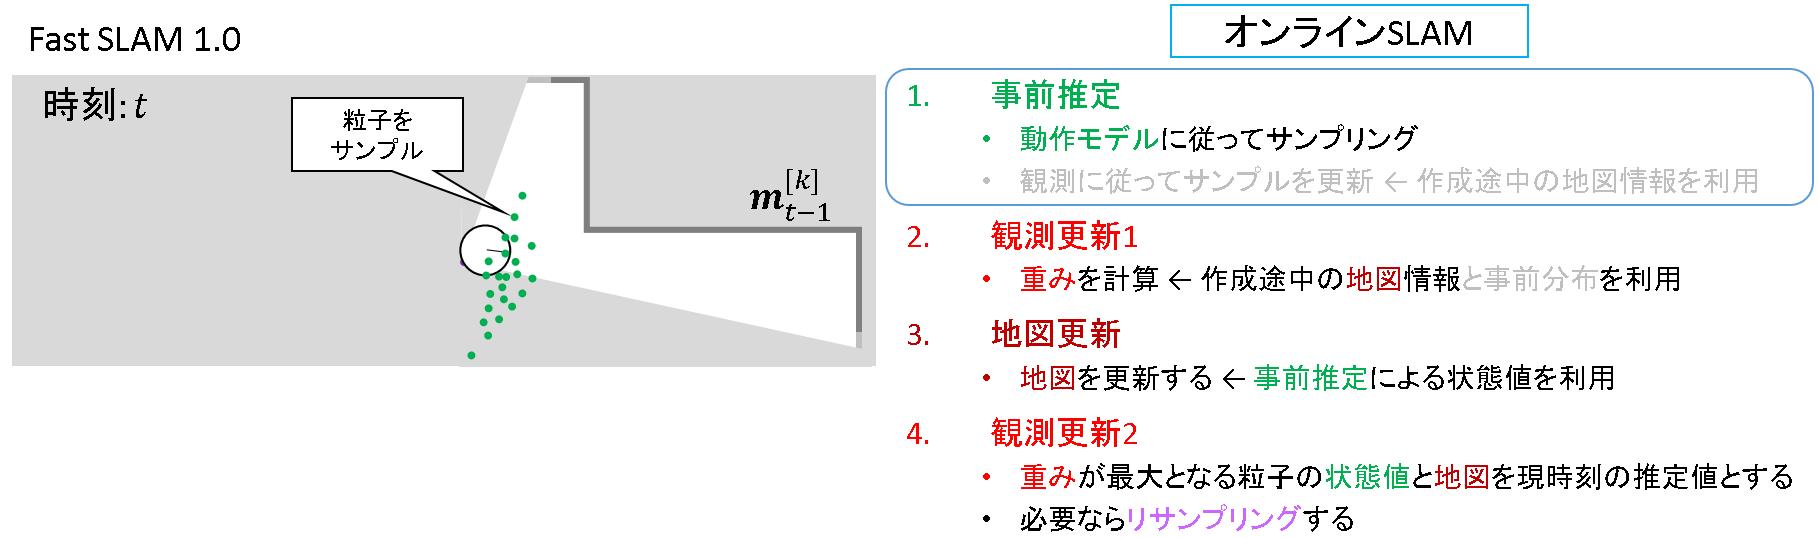 72_FastSLAM1.0_事前推定.png